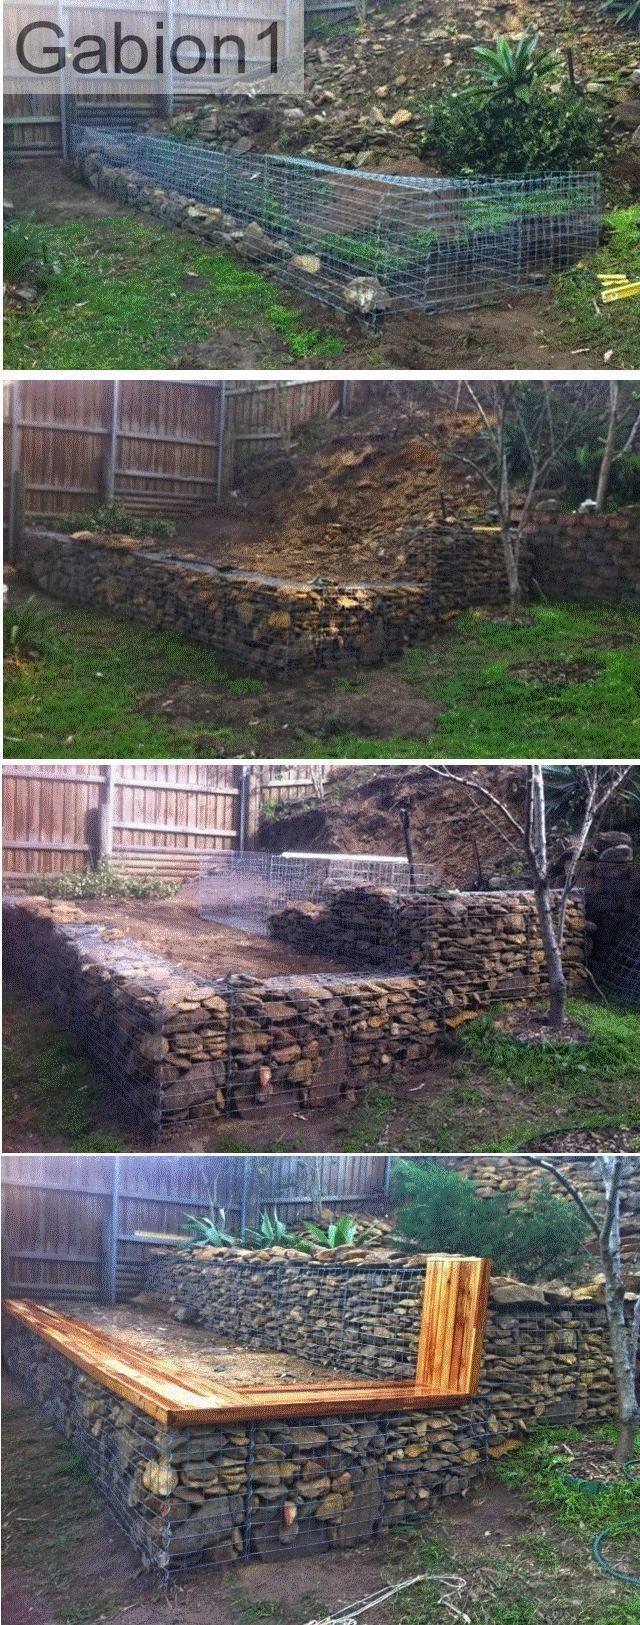 stepped gabion garden retaining wall http://www.gabion1.com.au